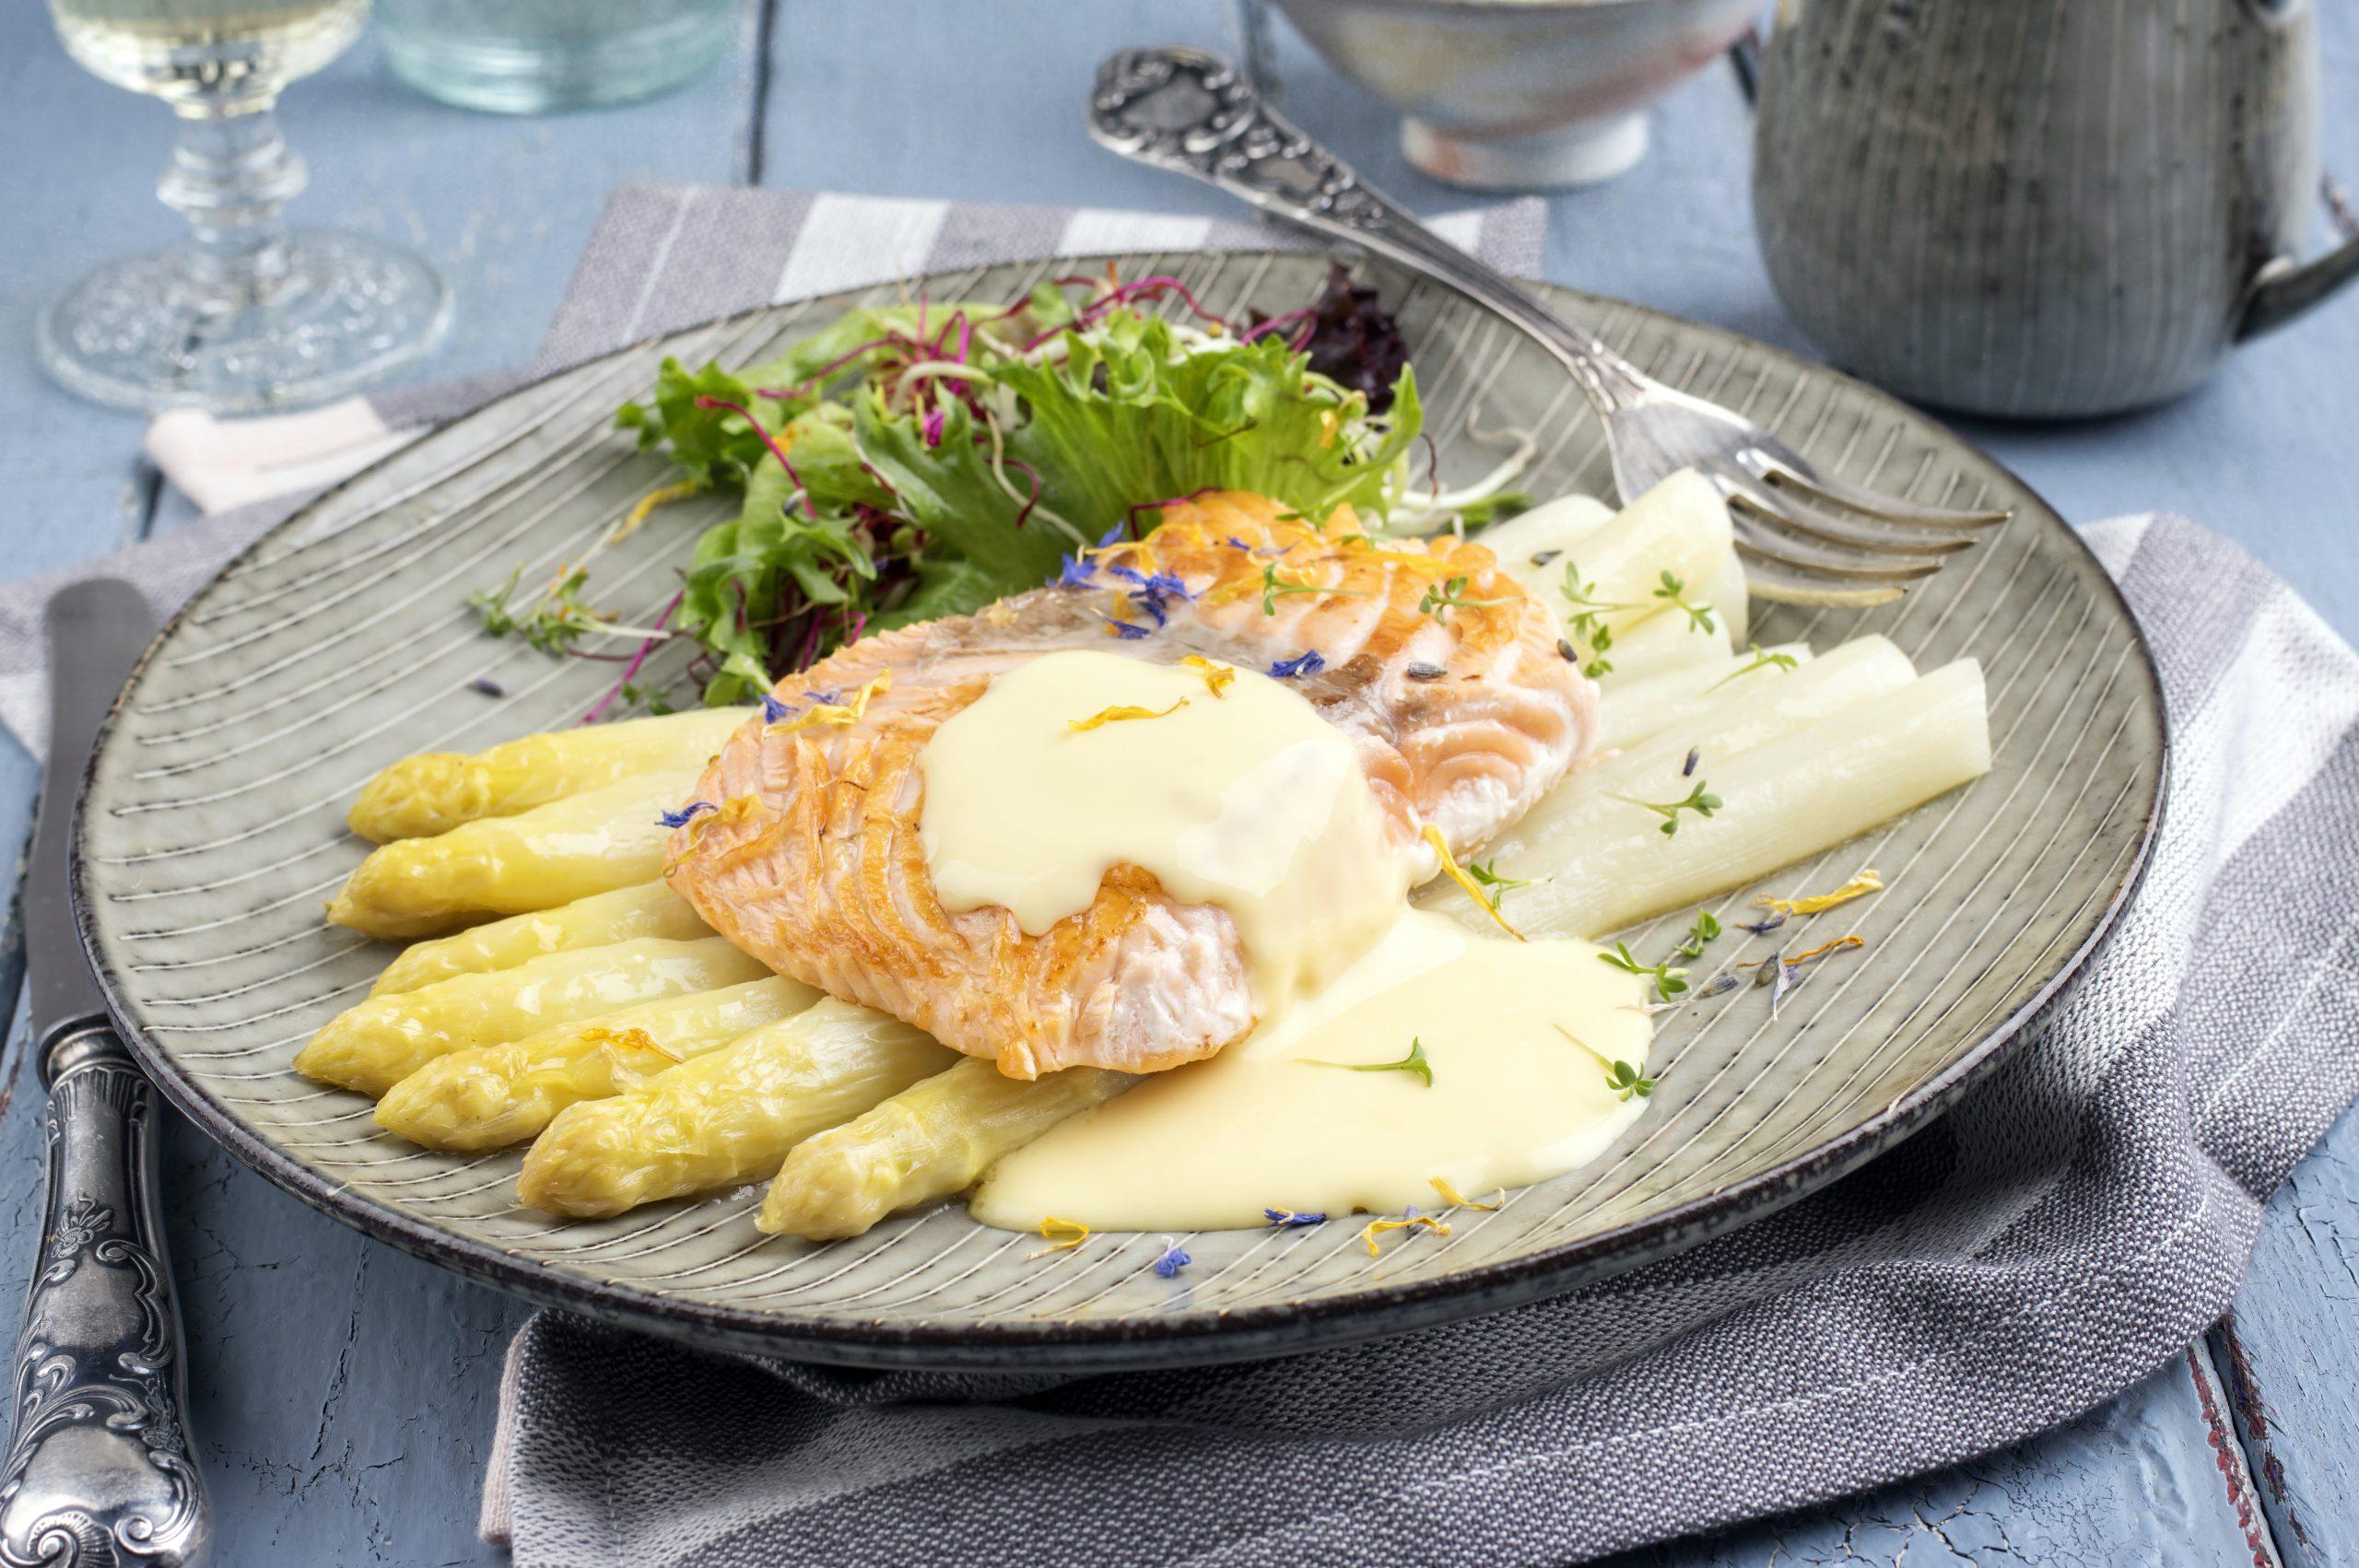 zalm met witte asperges en hollandaise saus